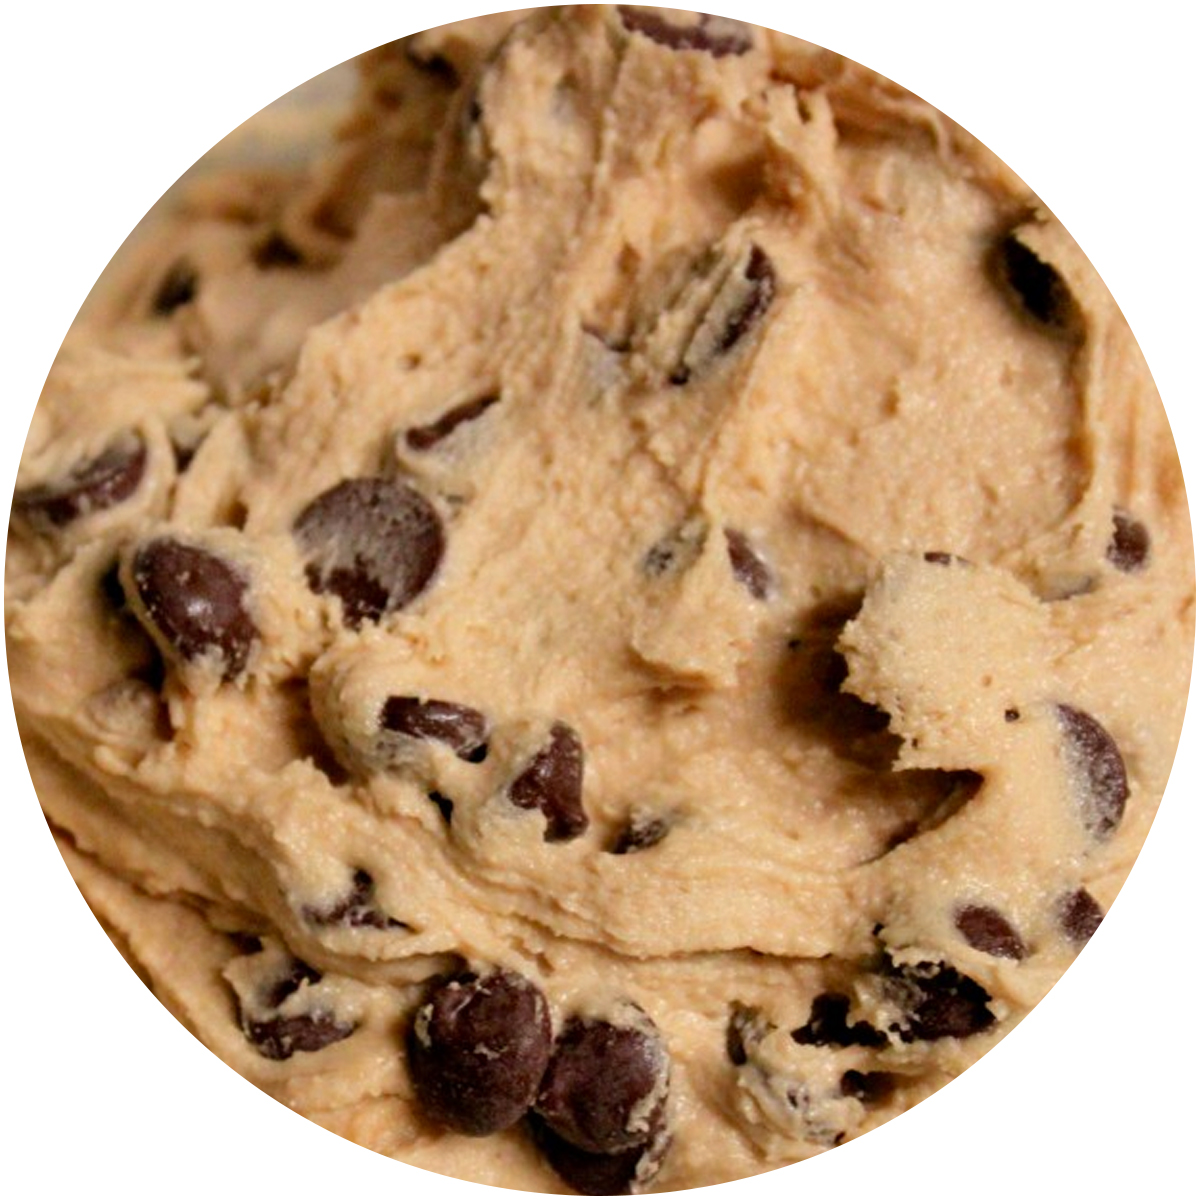 cookiedough.jpg